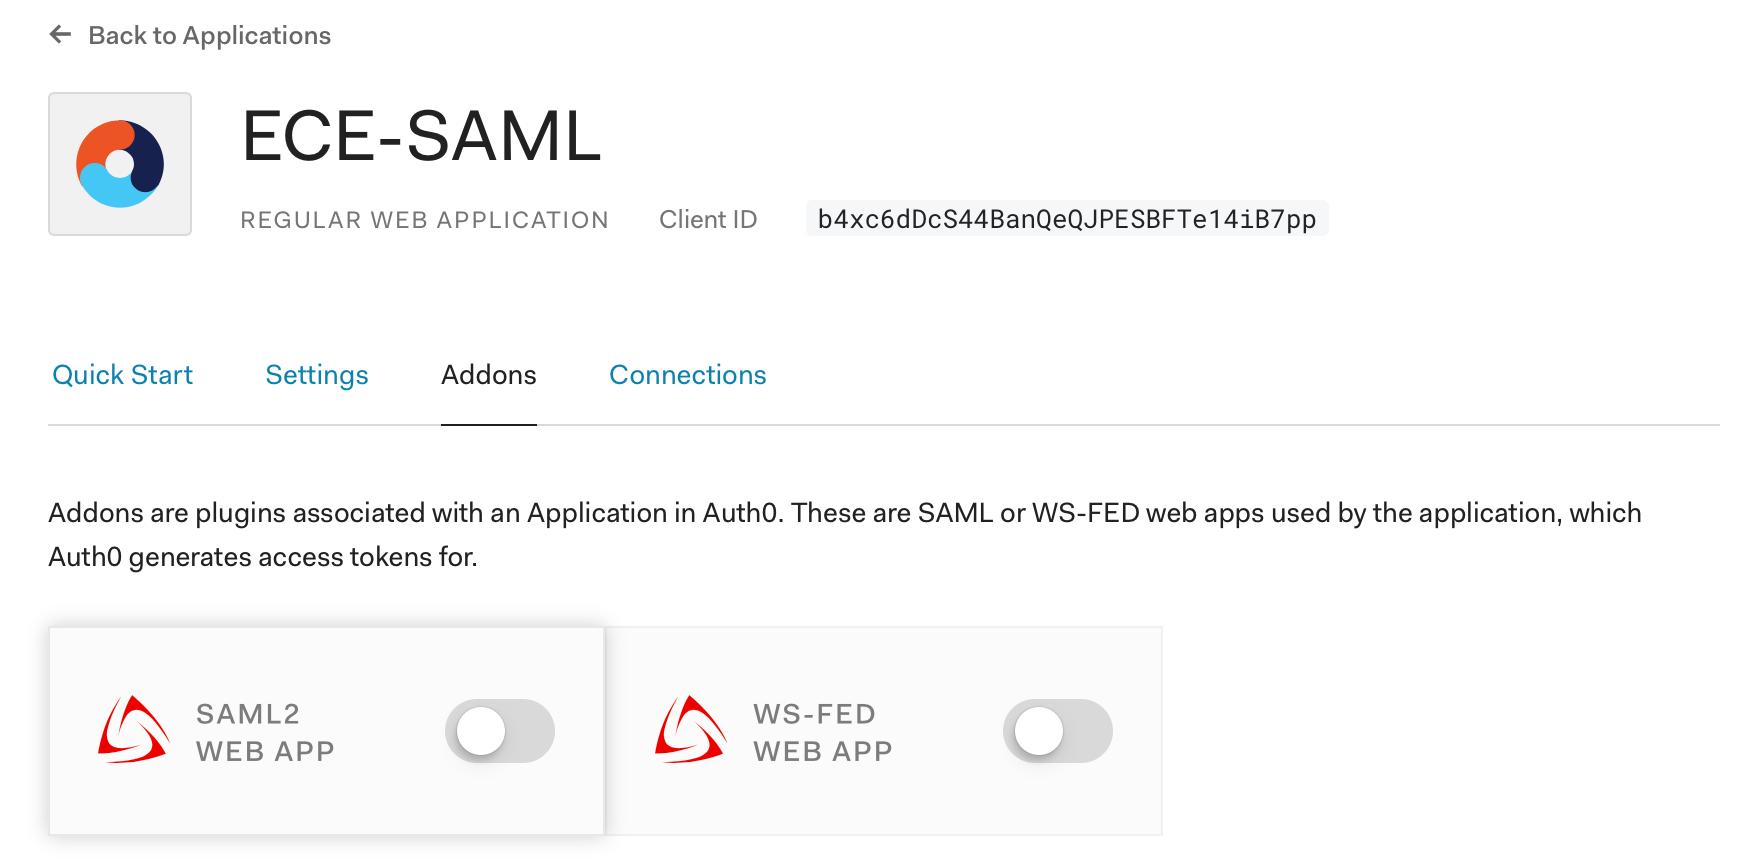 Enable the SAML 2 Web App